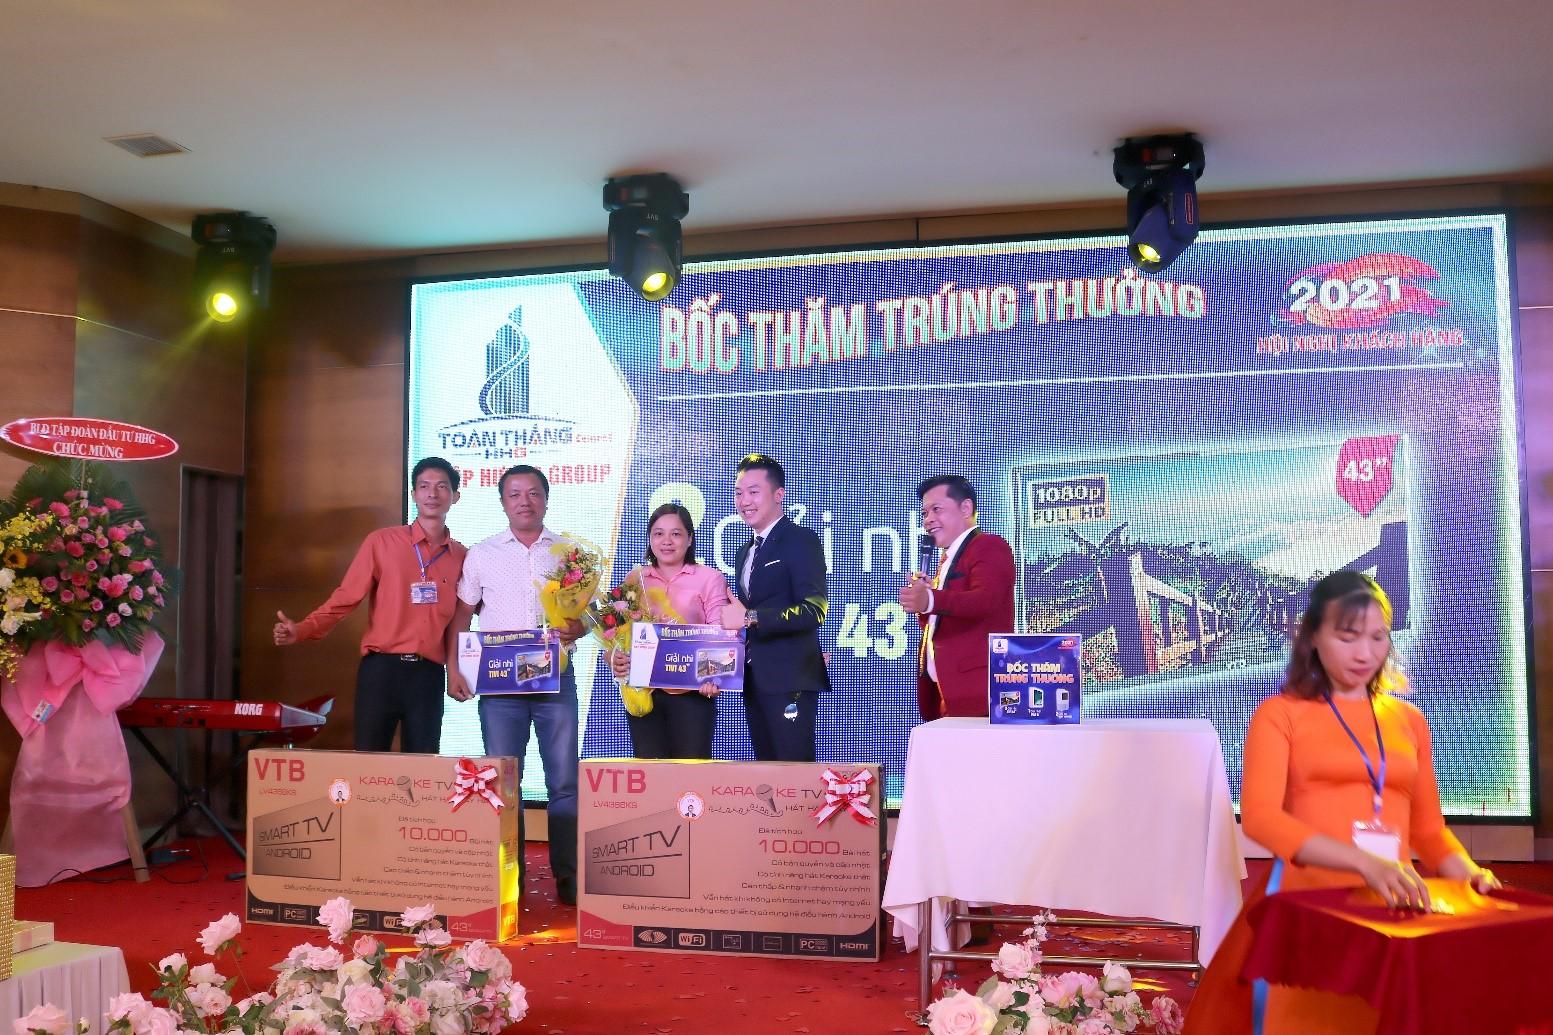 Toan Thang 06